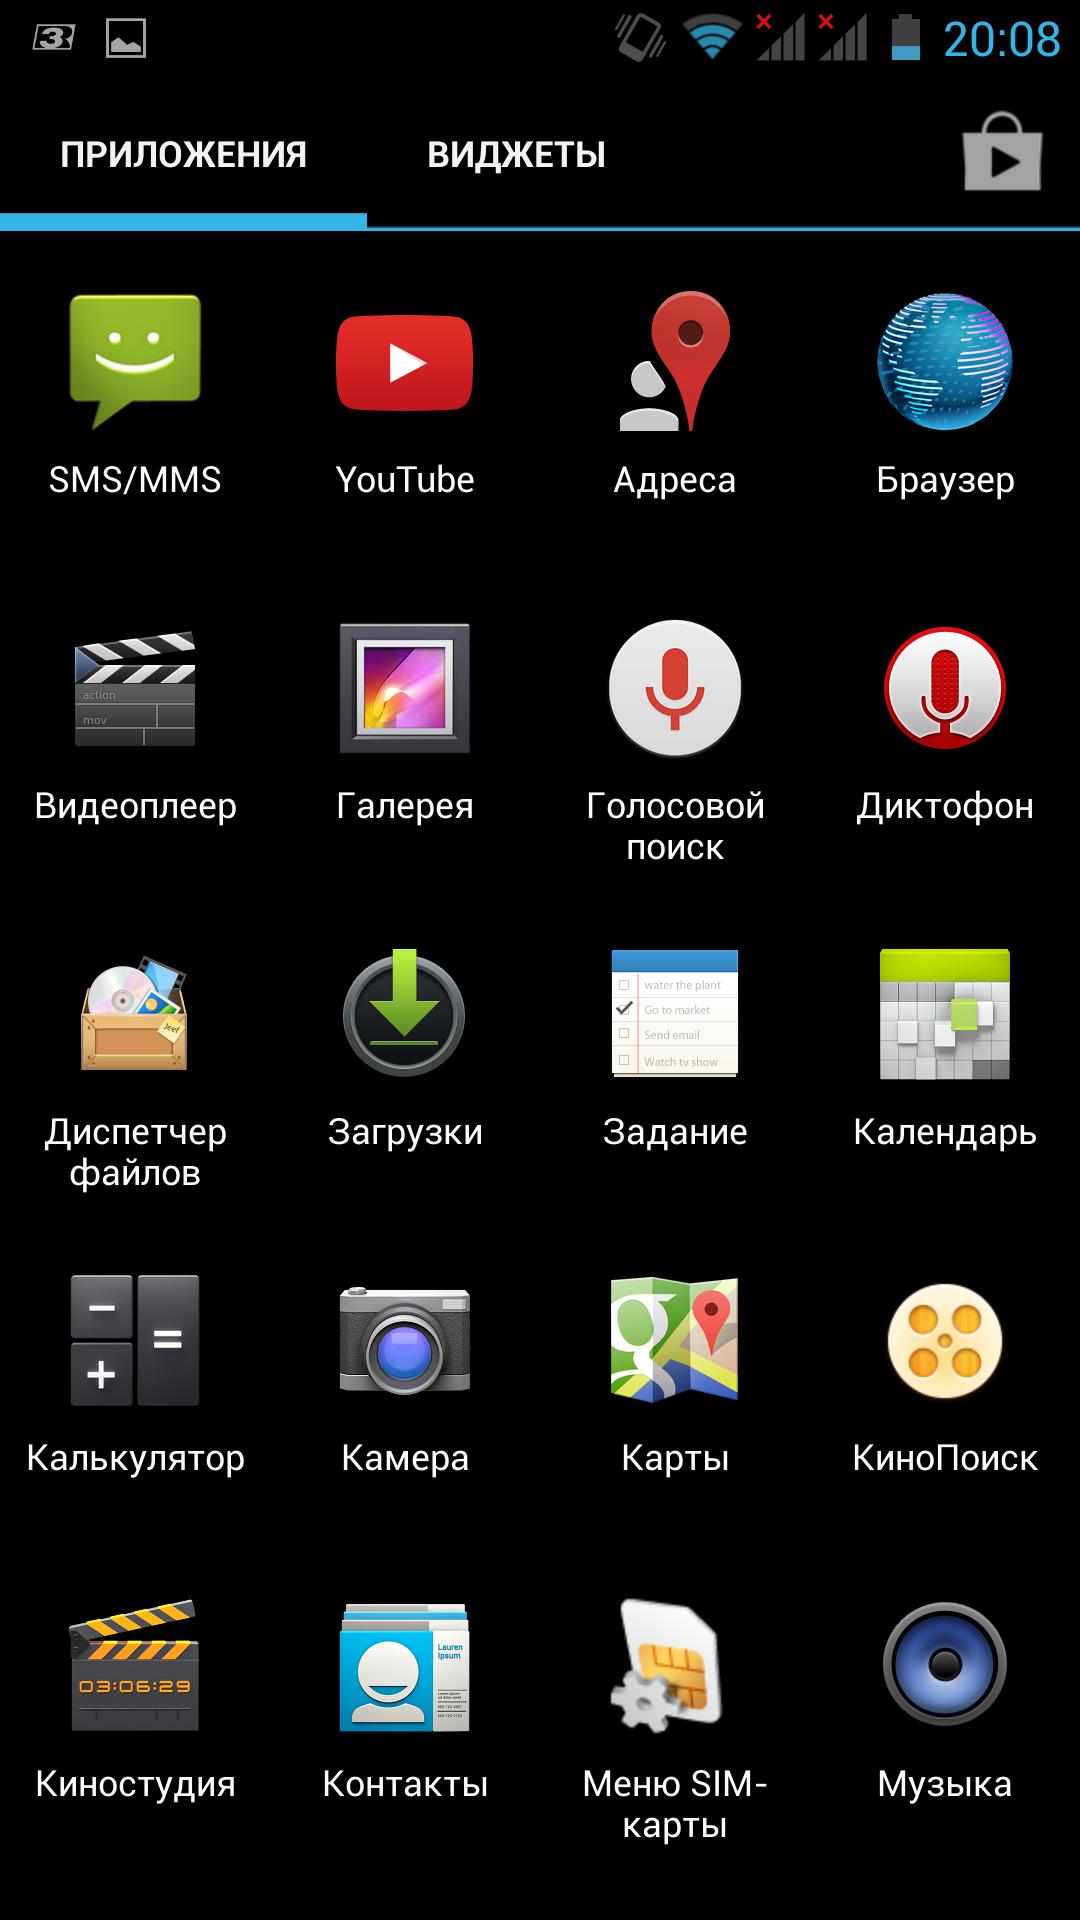 Screenshot_2014-07-11-20-08-08